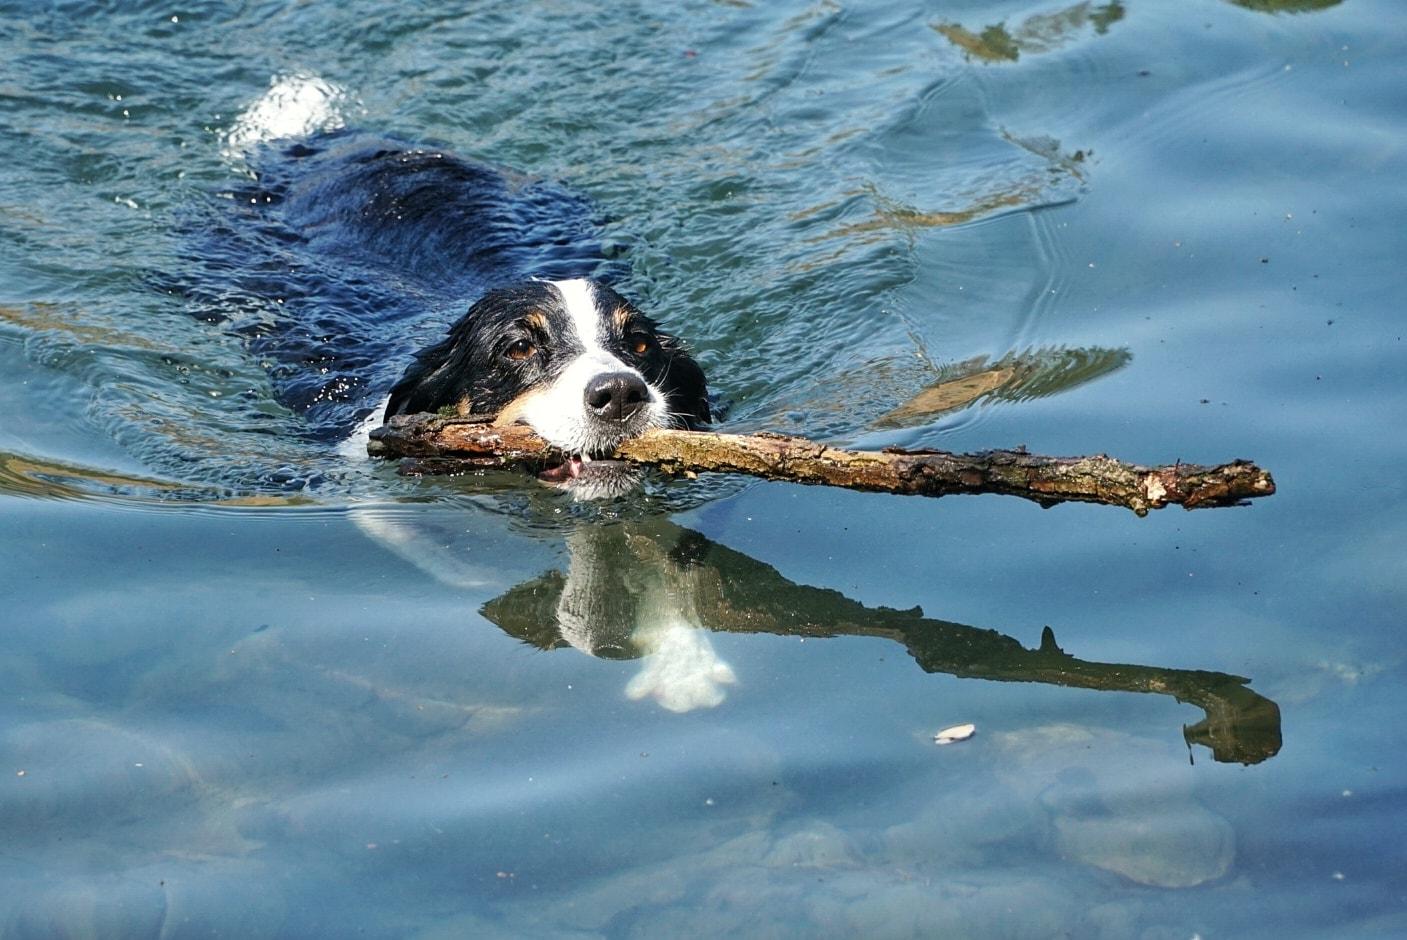 Wasservergiftung bei Hunden